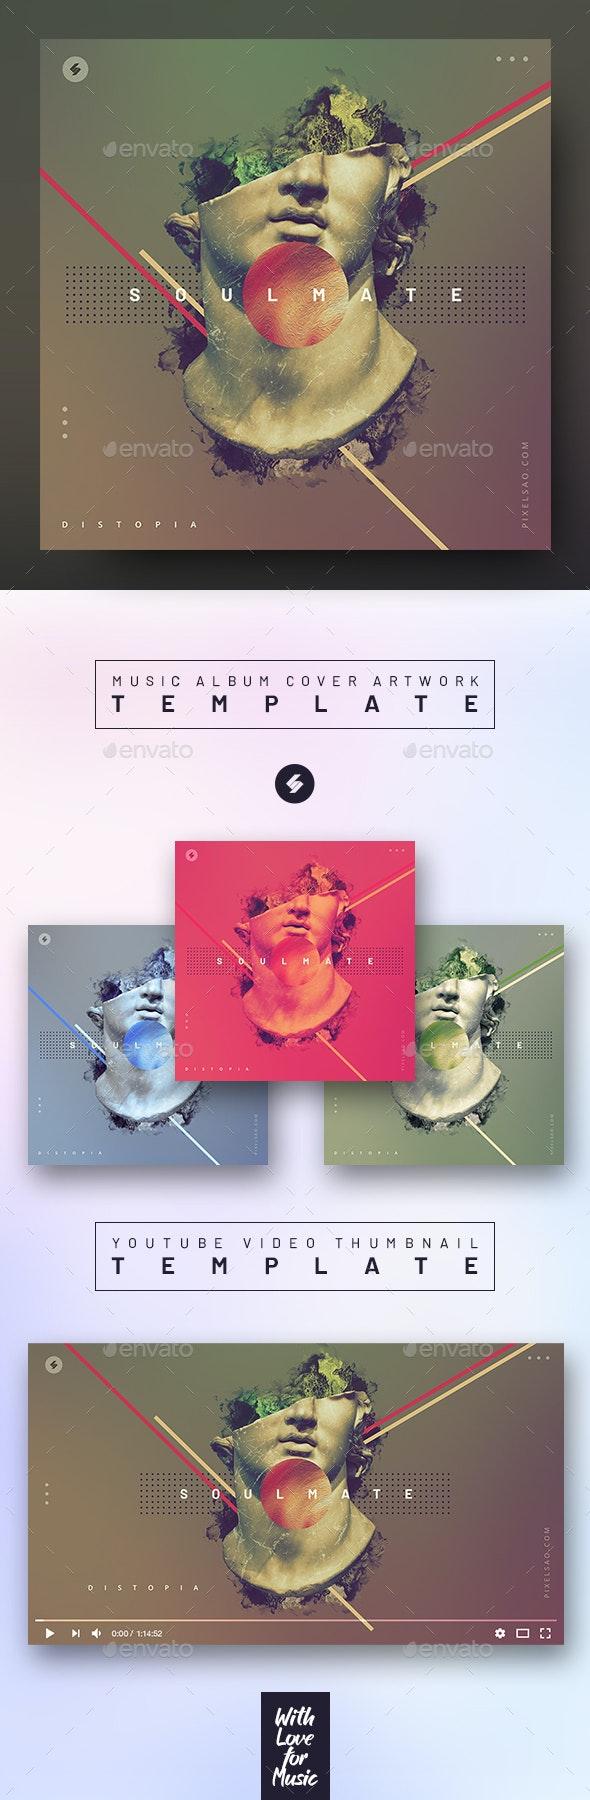 Soulmate – Music Album Cover Artwork / Video Thumbnail Template - Miscellaneous Social Media